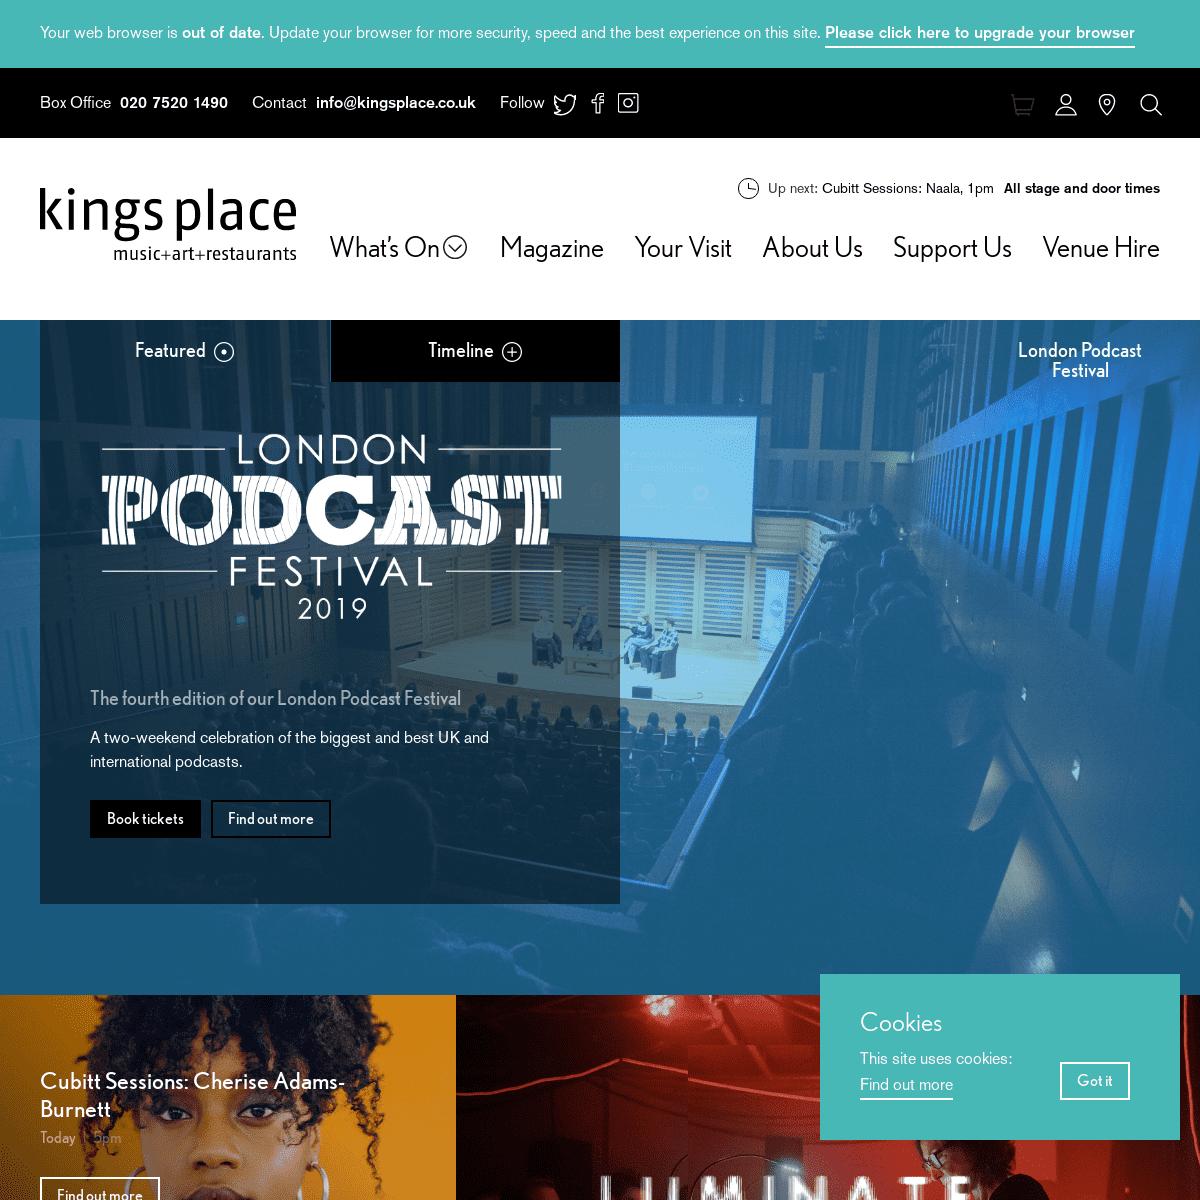 Kings Place - Music + Art + Restaurants